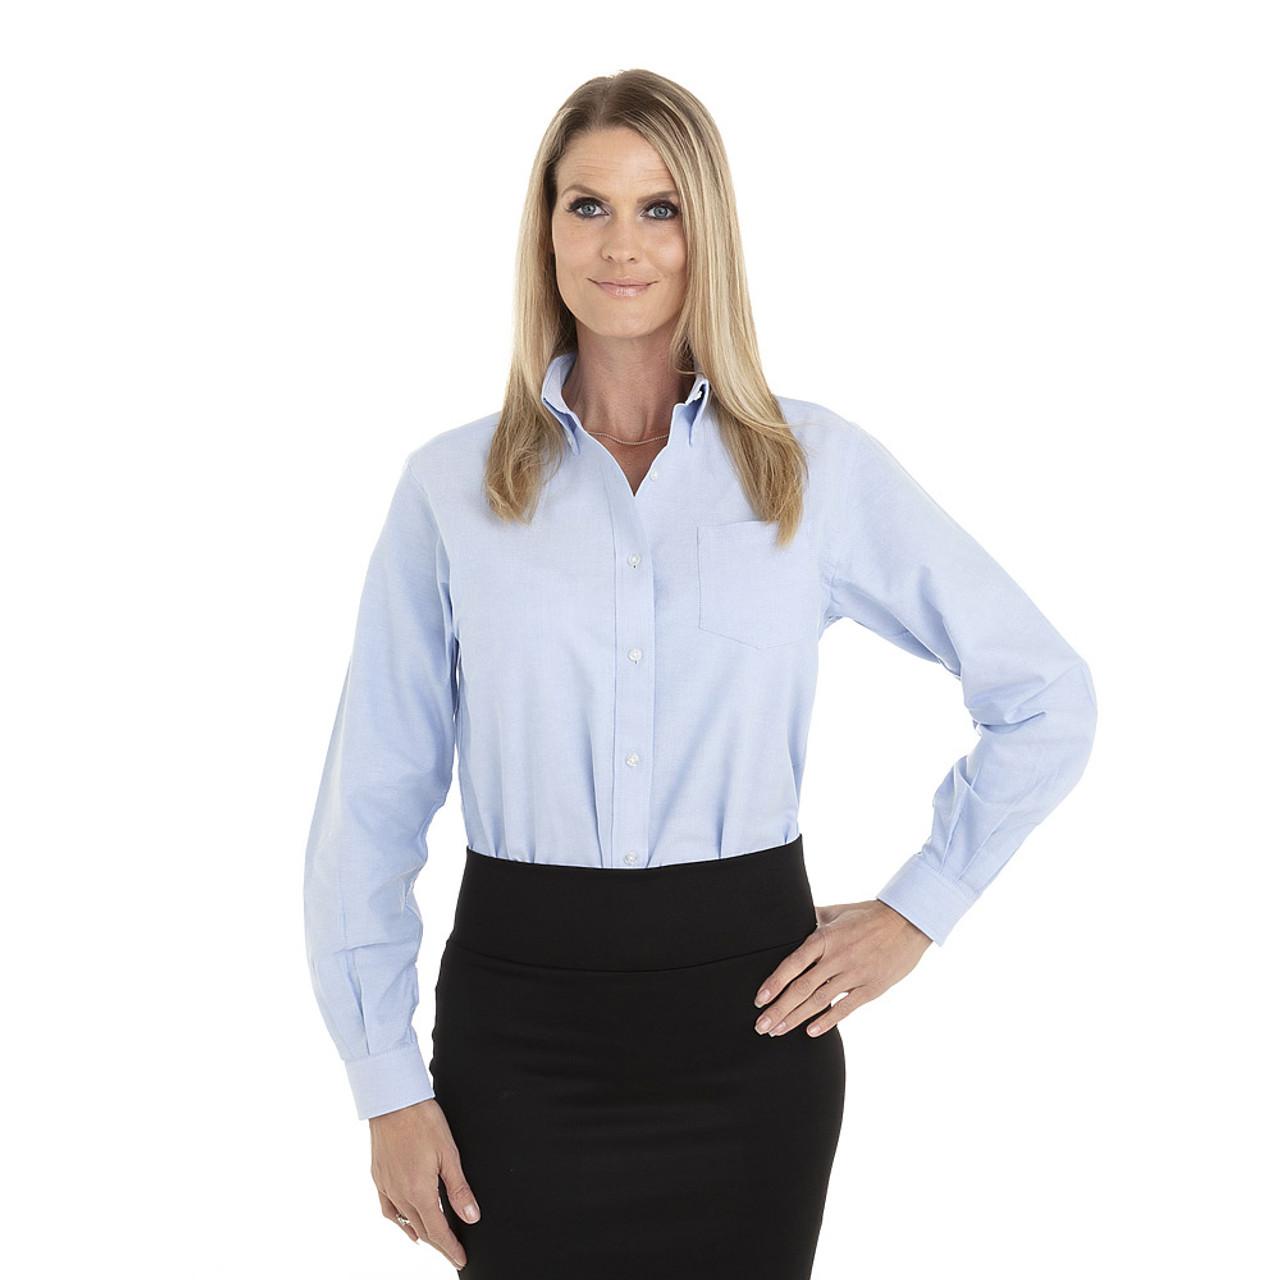 Blue - 18CV300 Van Heusen Ladies' Long Sleeve Oxford Shirt | T-shirt.ca